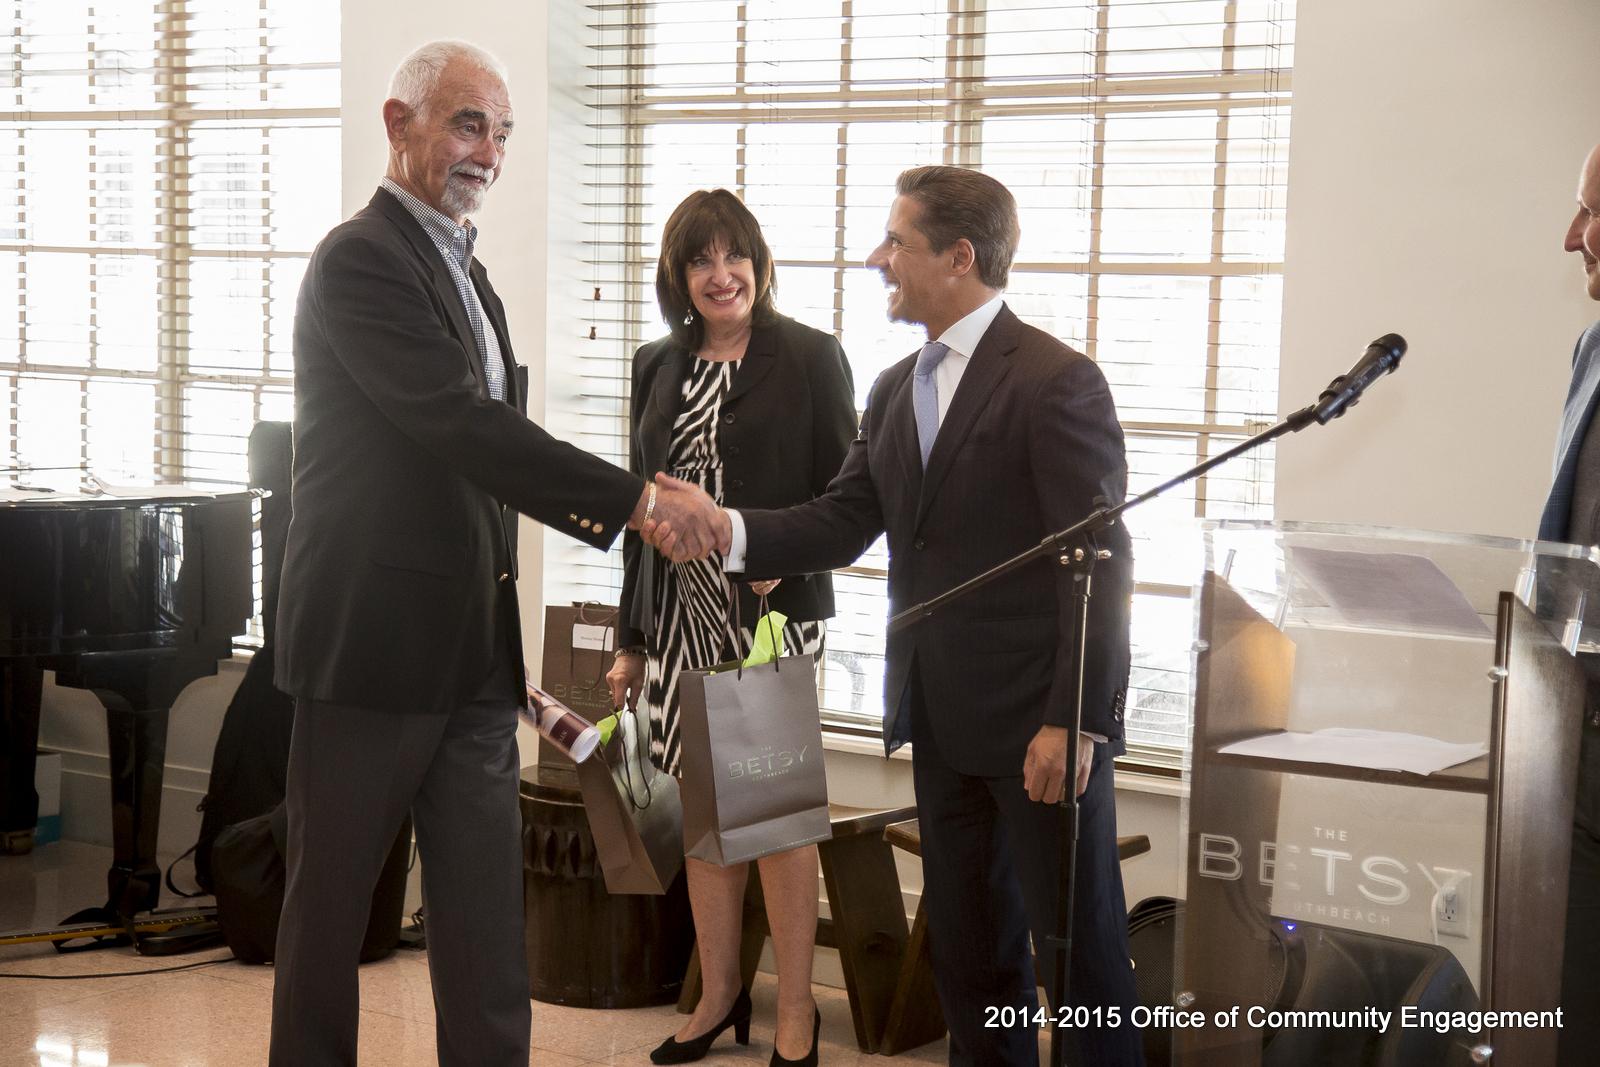 Elie Wiesel AwardsBetsy Hotel05_20_2015Jimmy Abraham_MDCPS_31.jpg